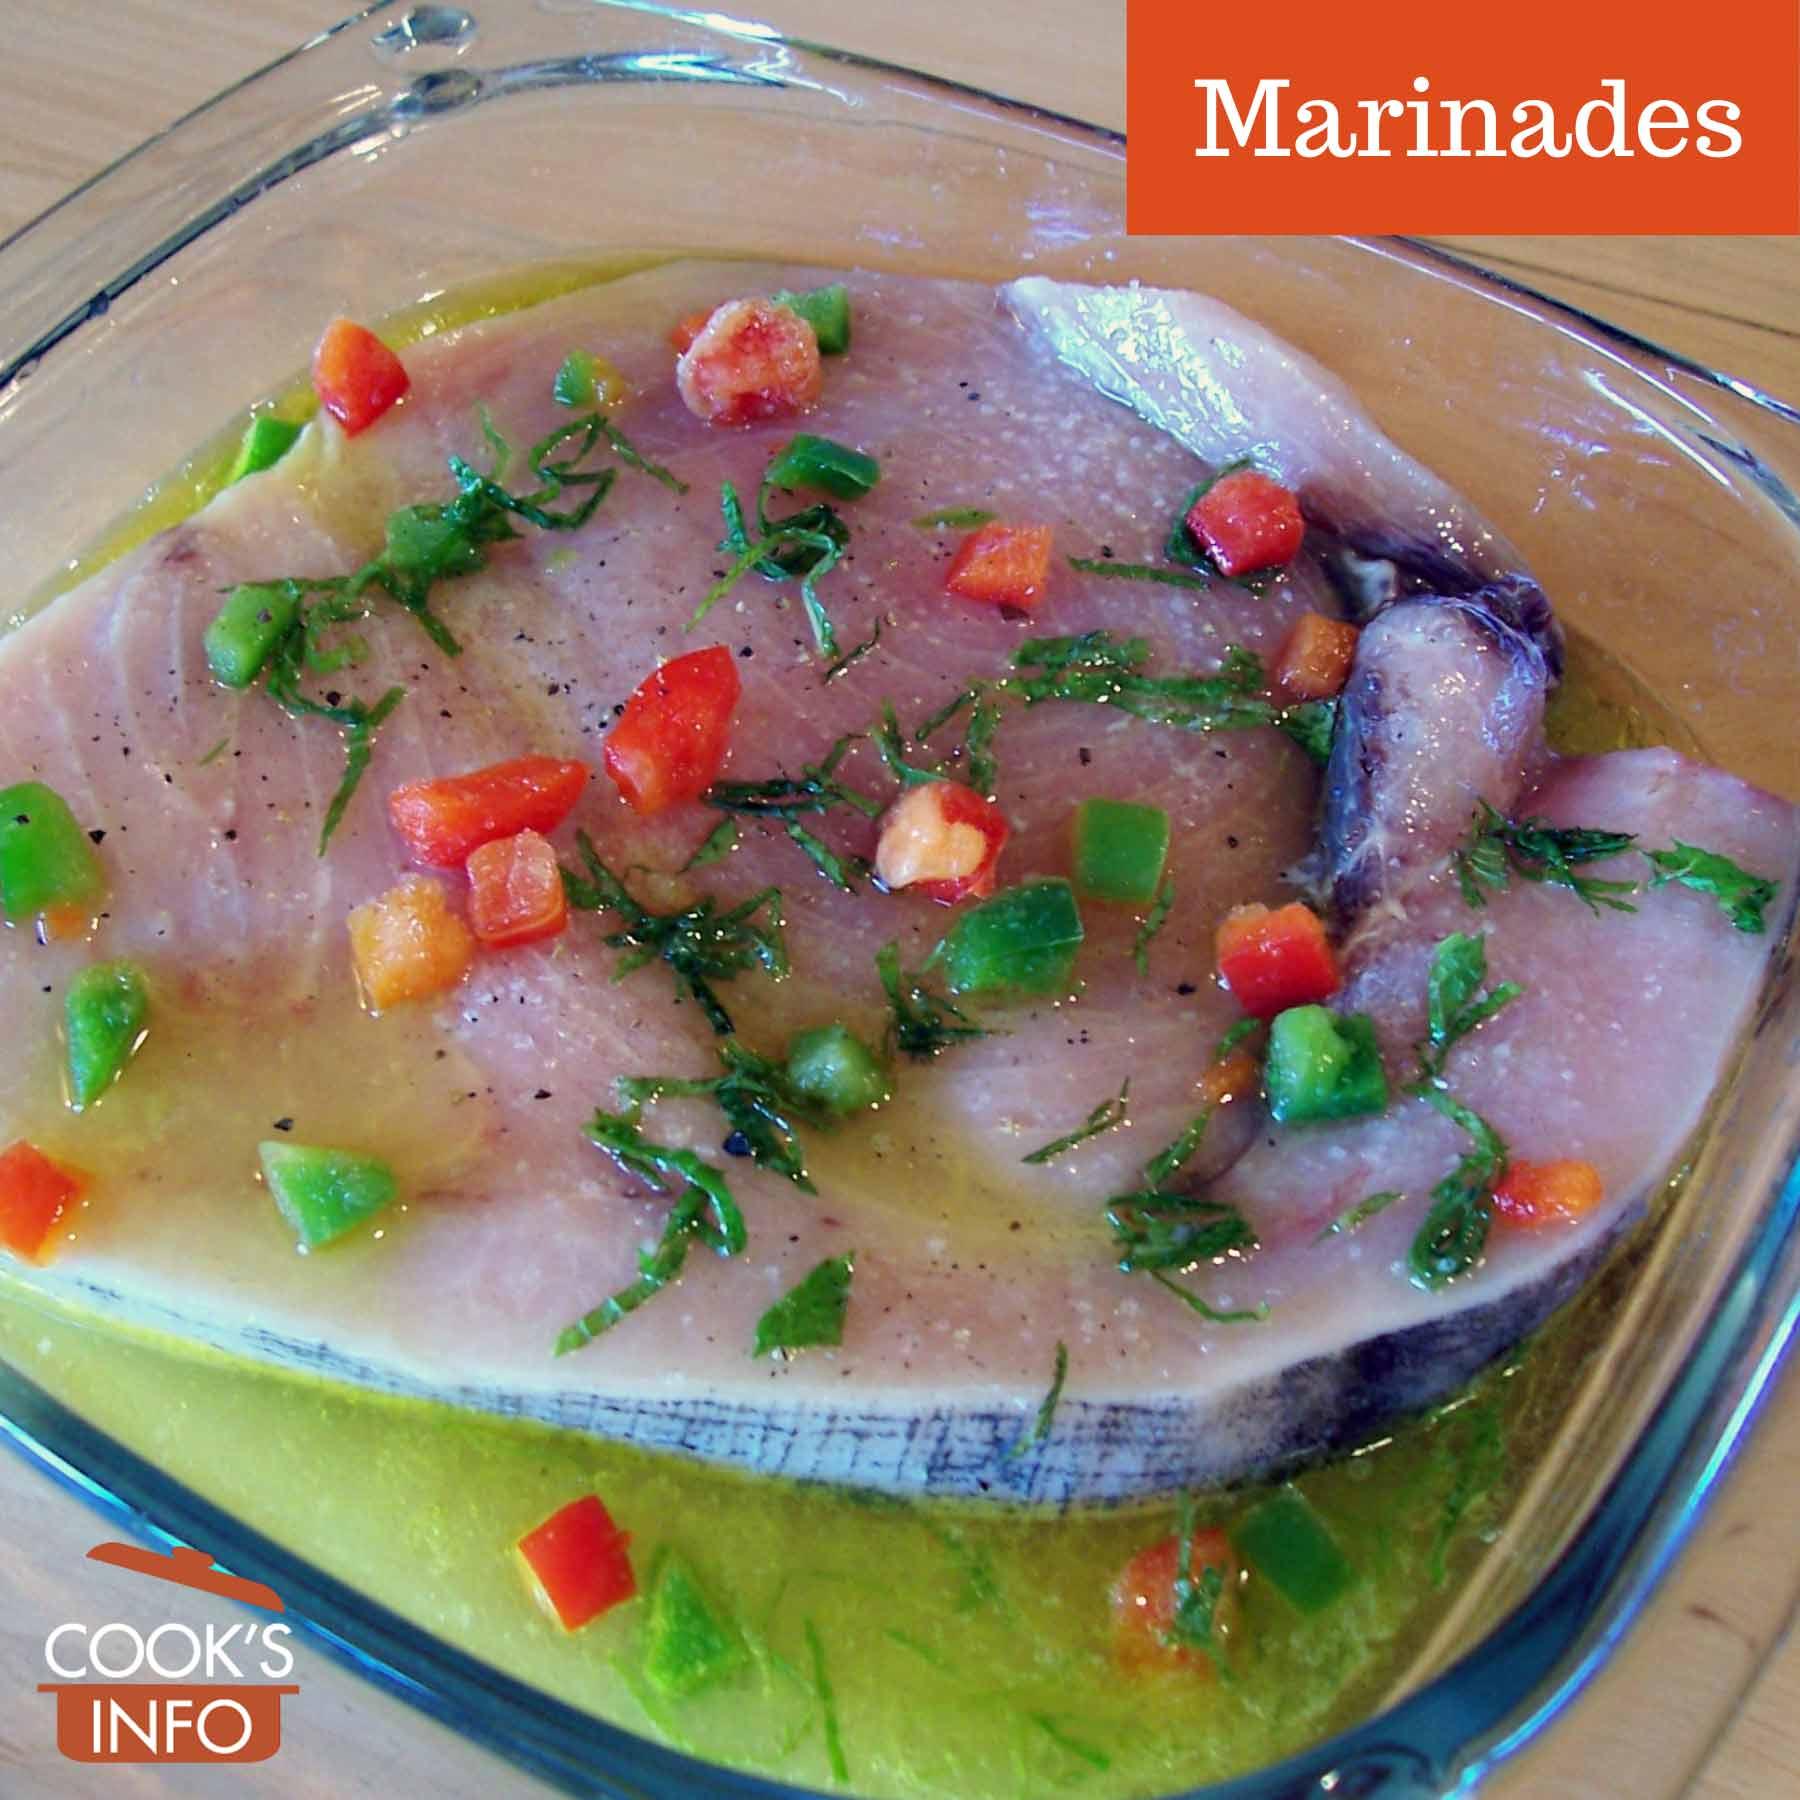 Swordfish steak in marinade